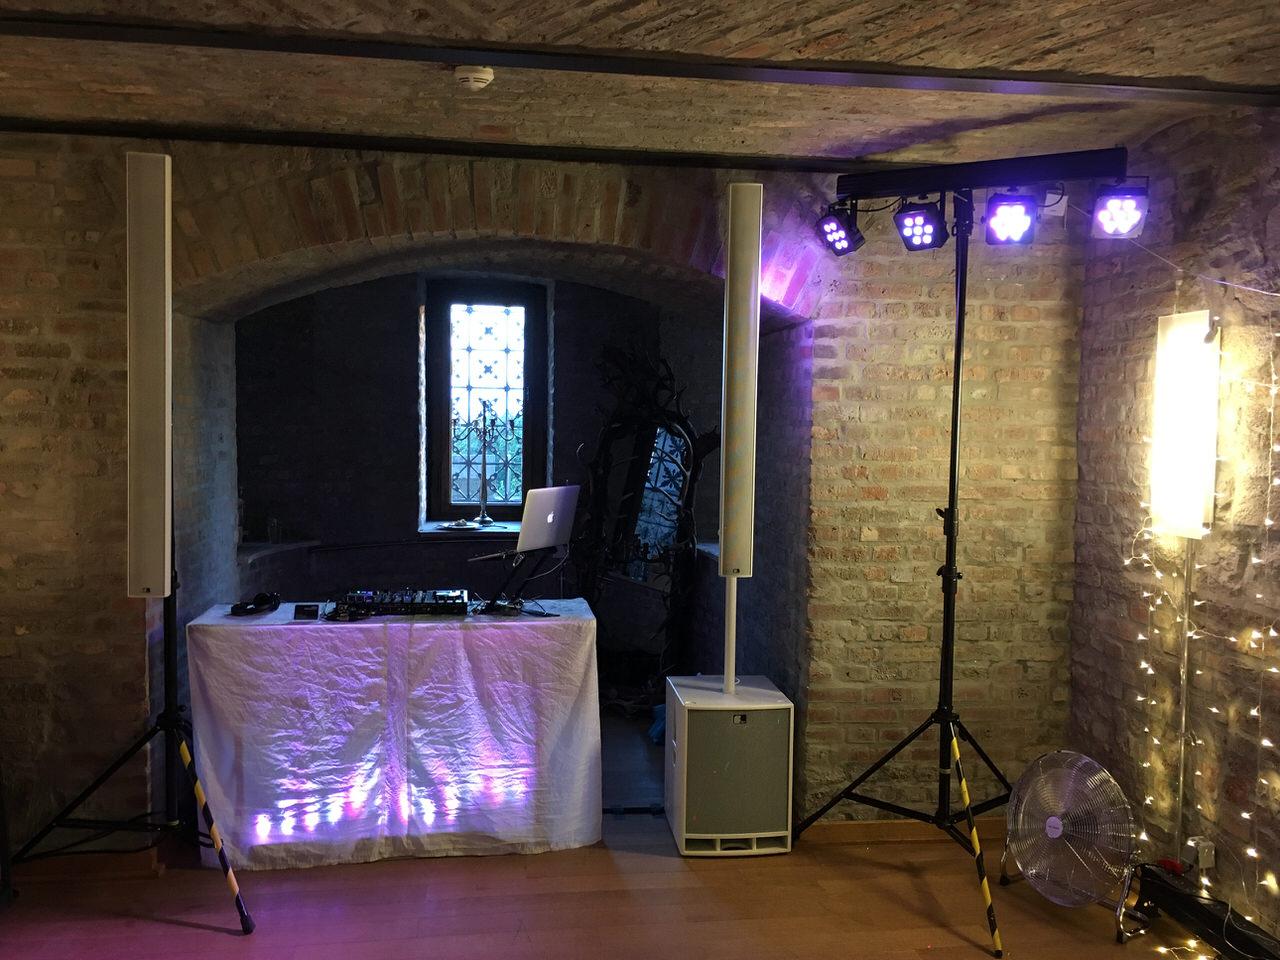 DJ Aufbau im Speisesaal von Schloss Drachenburg. Foto: Andreas Paul / Paul van Groove